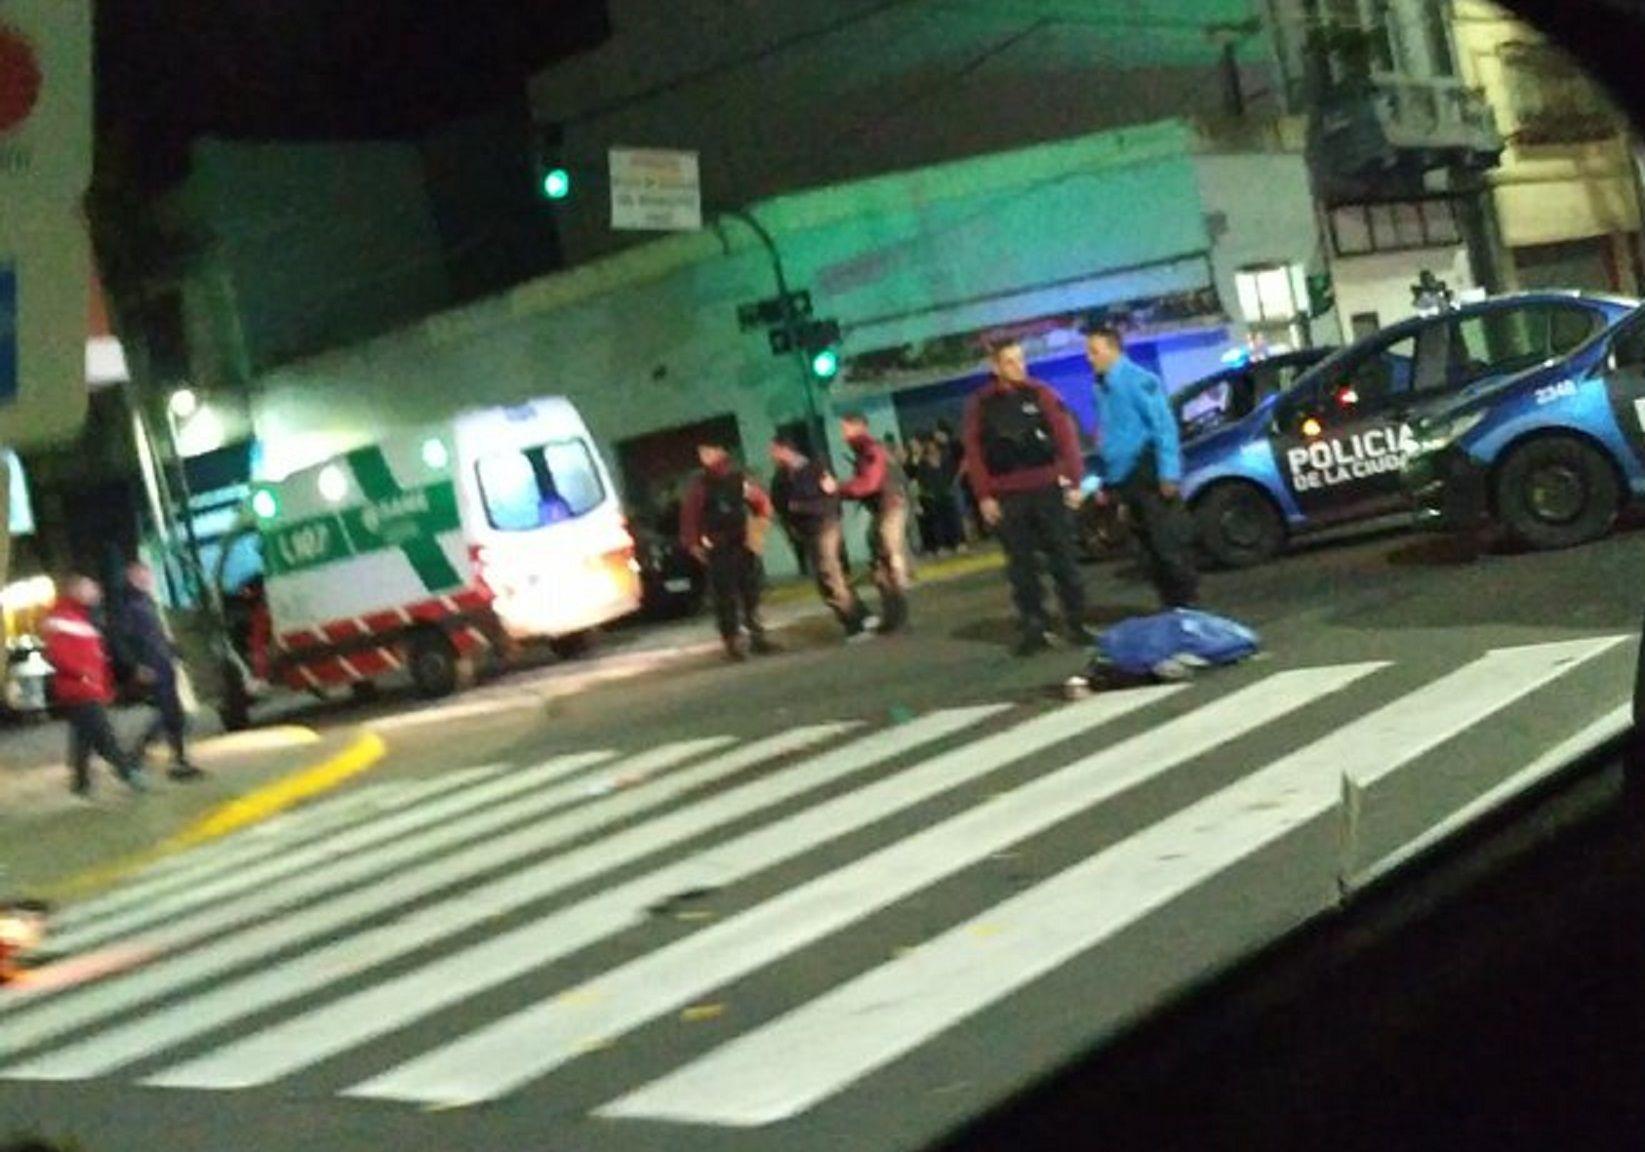 Un conductor atropelló y mató a un motociclista y huyó. Foto: @Taxivista